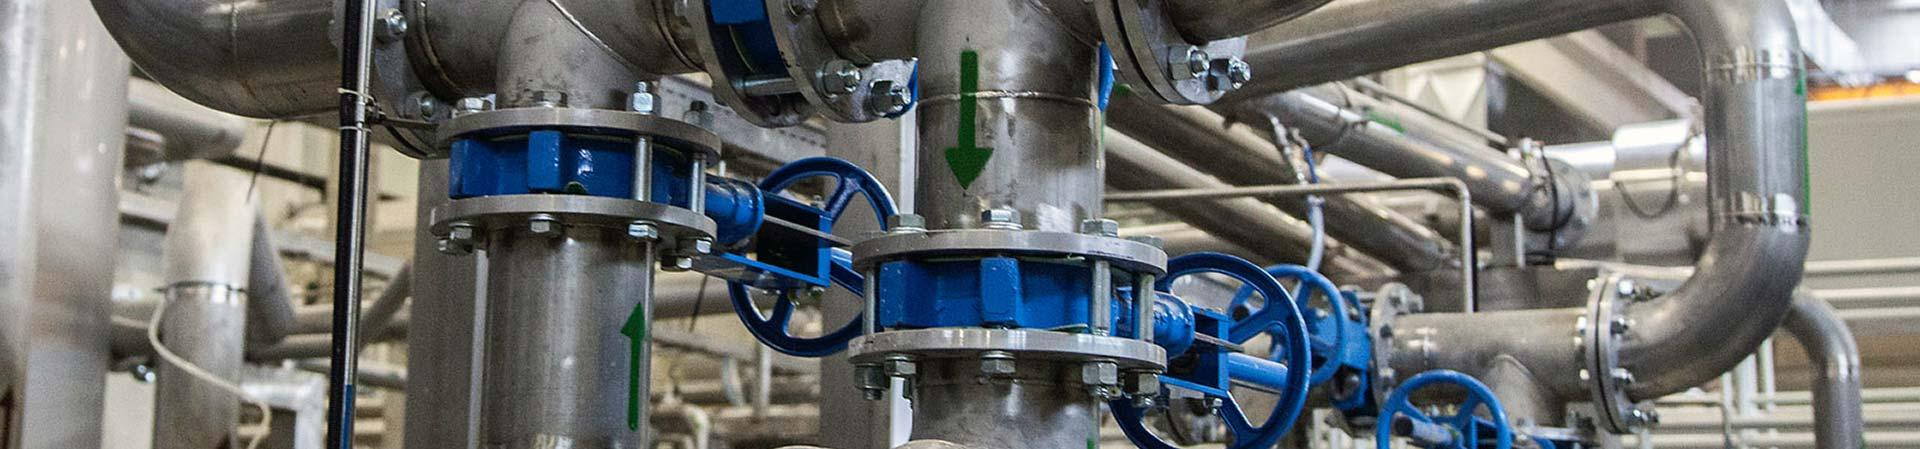 Commercial Industrial Leak Detection